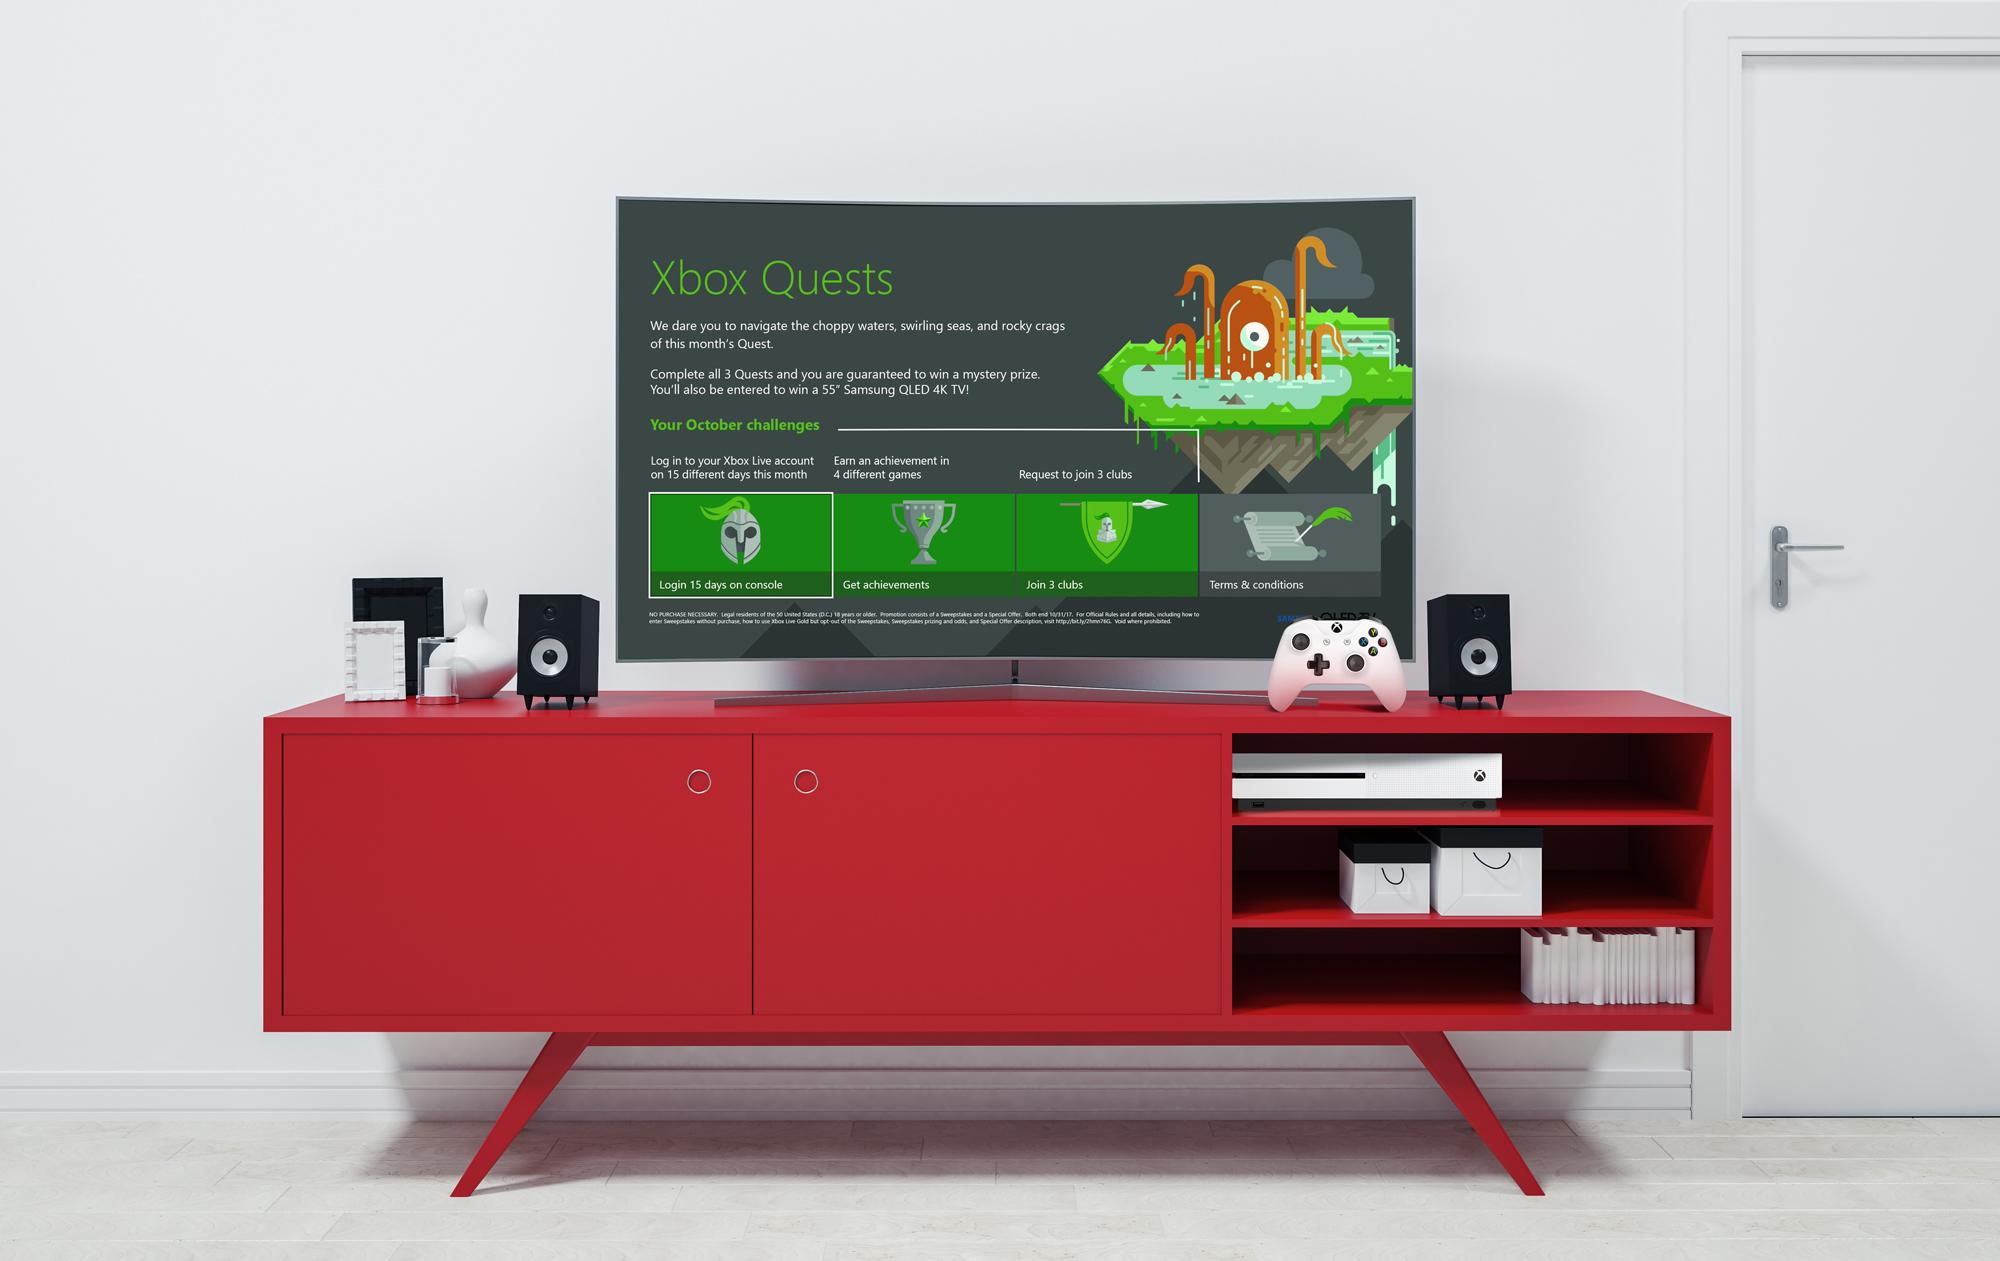 xbox_quests_livingroom_01.jpg